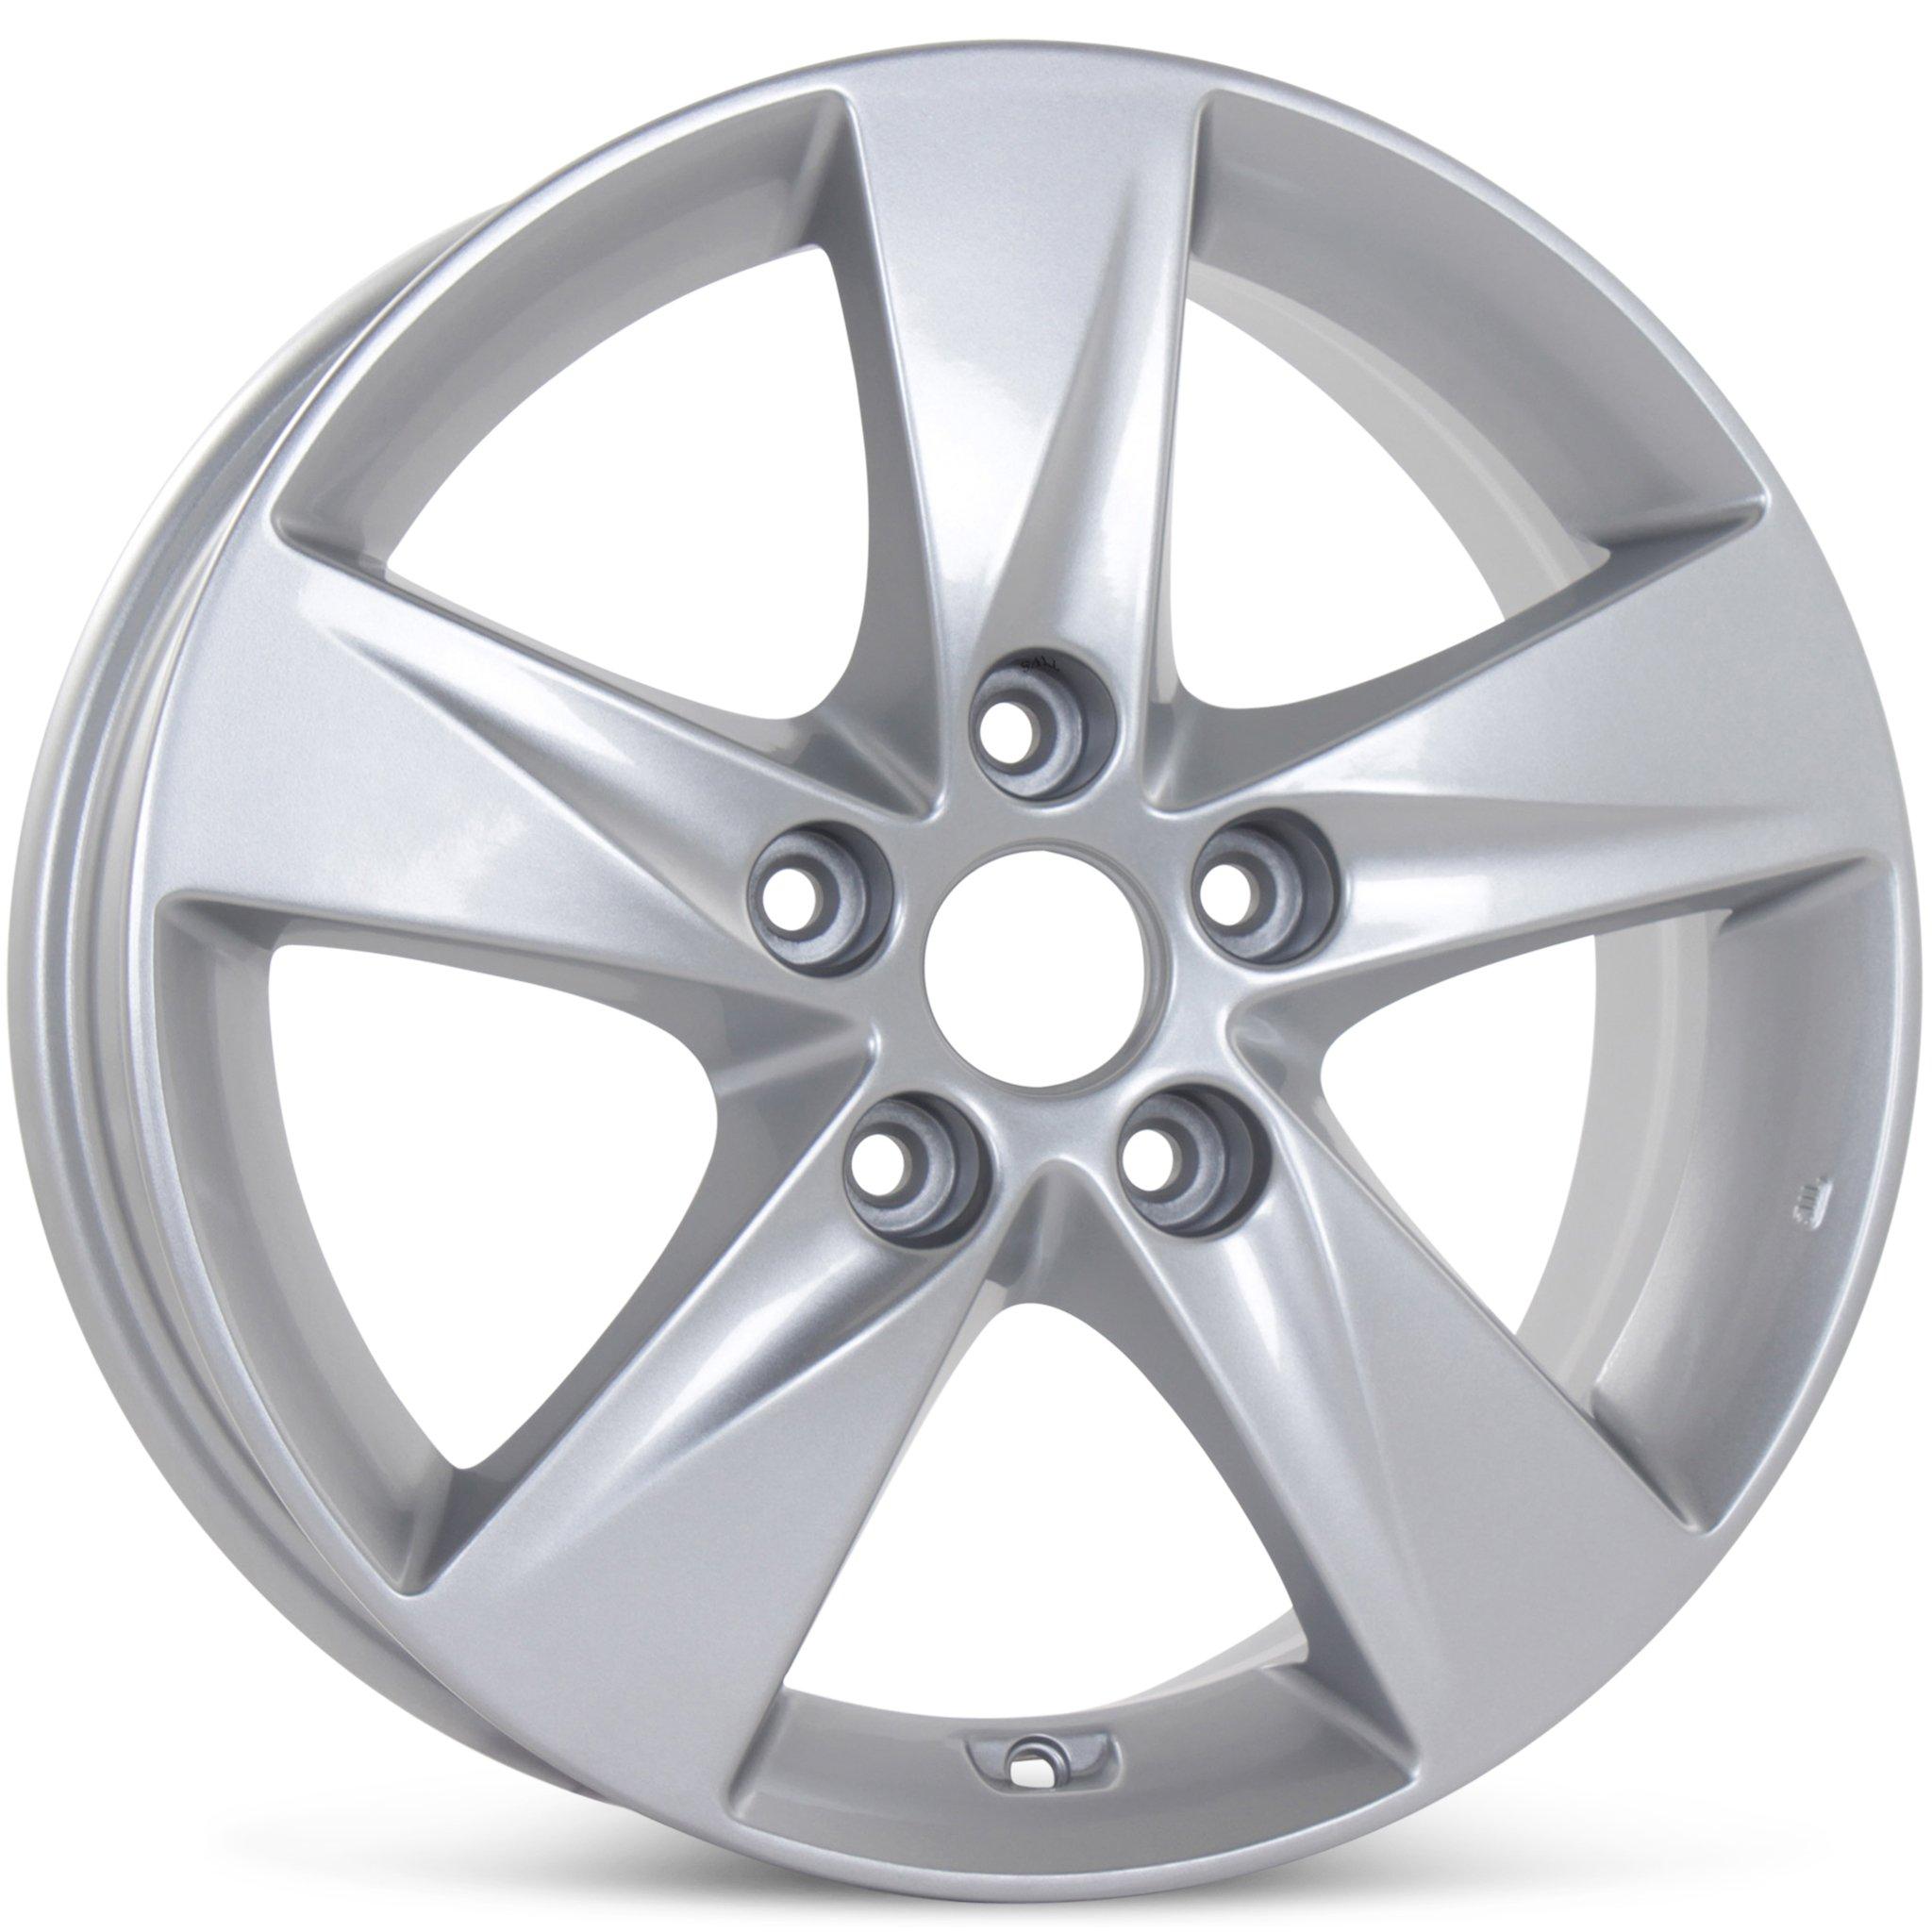 "New 16"" x 6.5"" Alloy Replacement Wheel for Hyundai Elantra 2011 2012 2013 Rim Silver 70806"